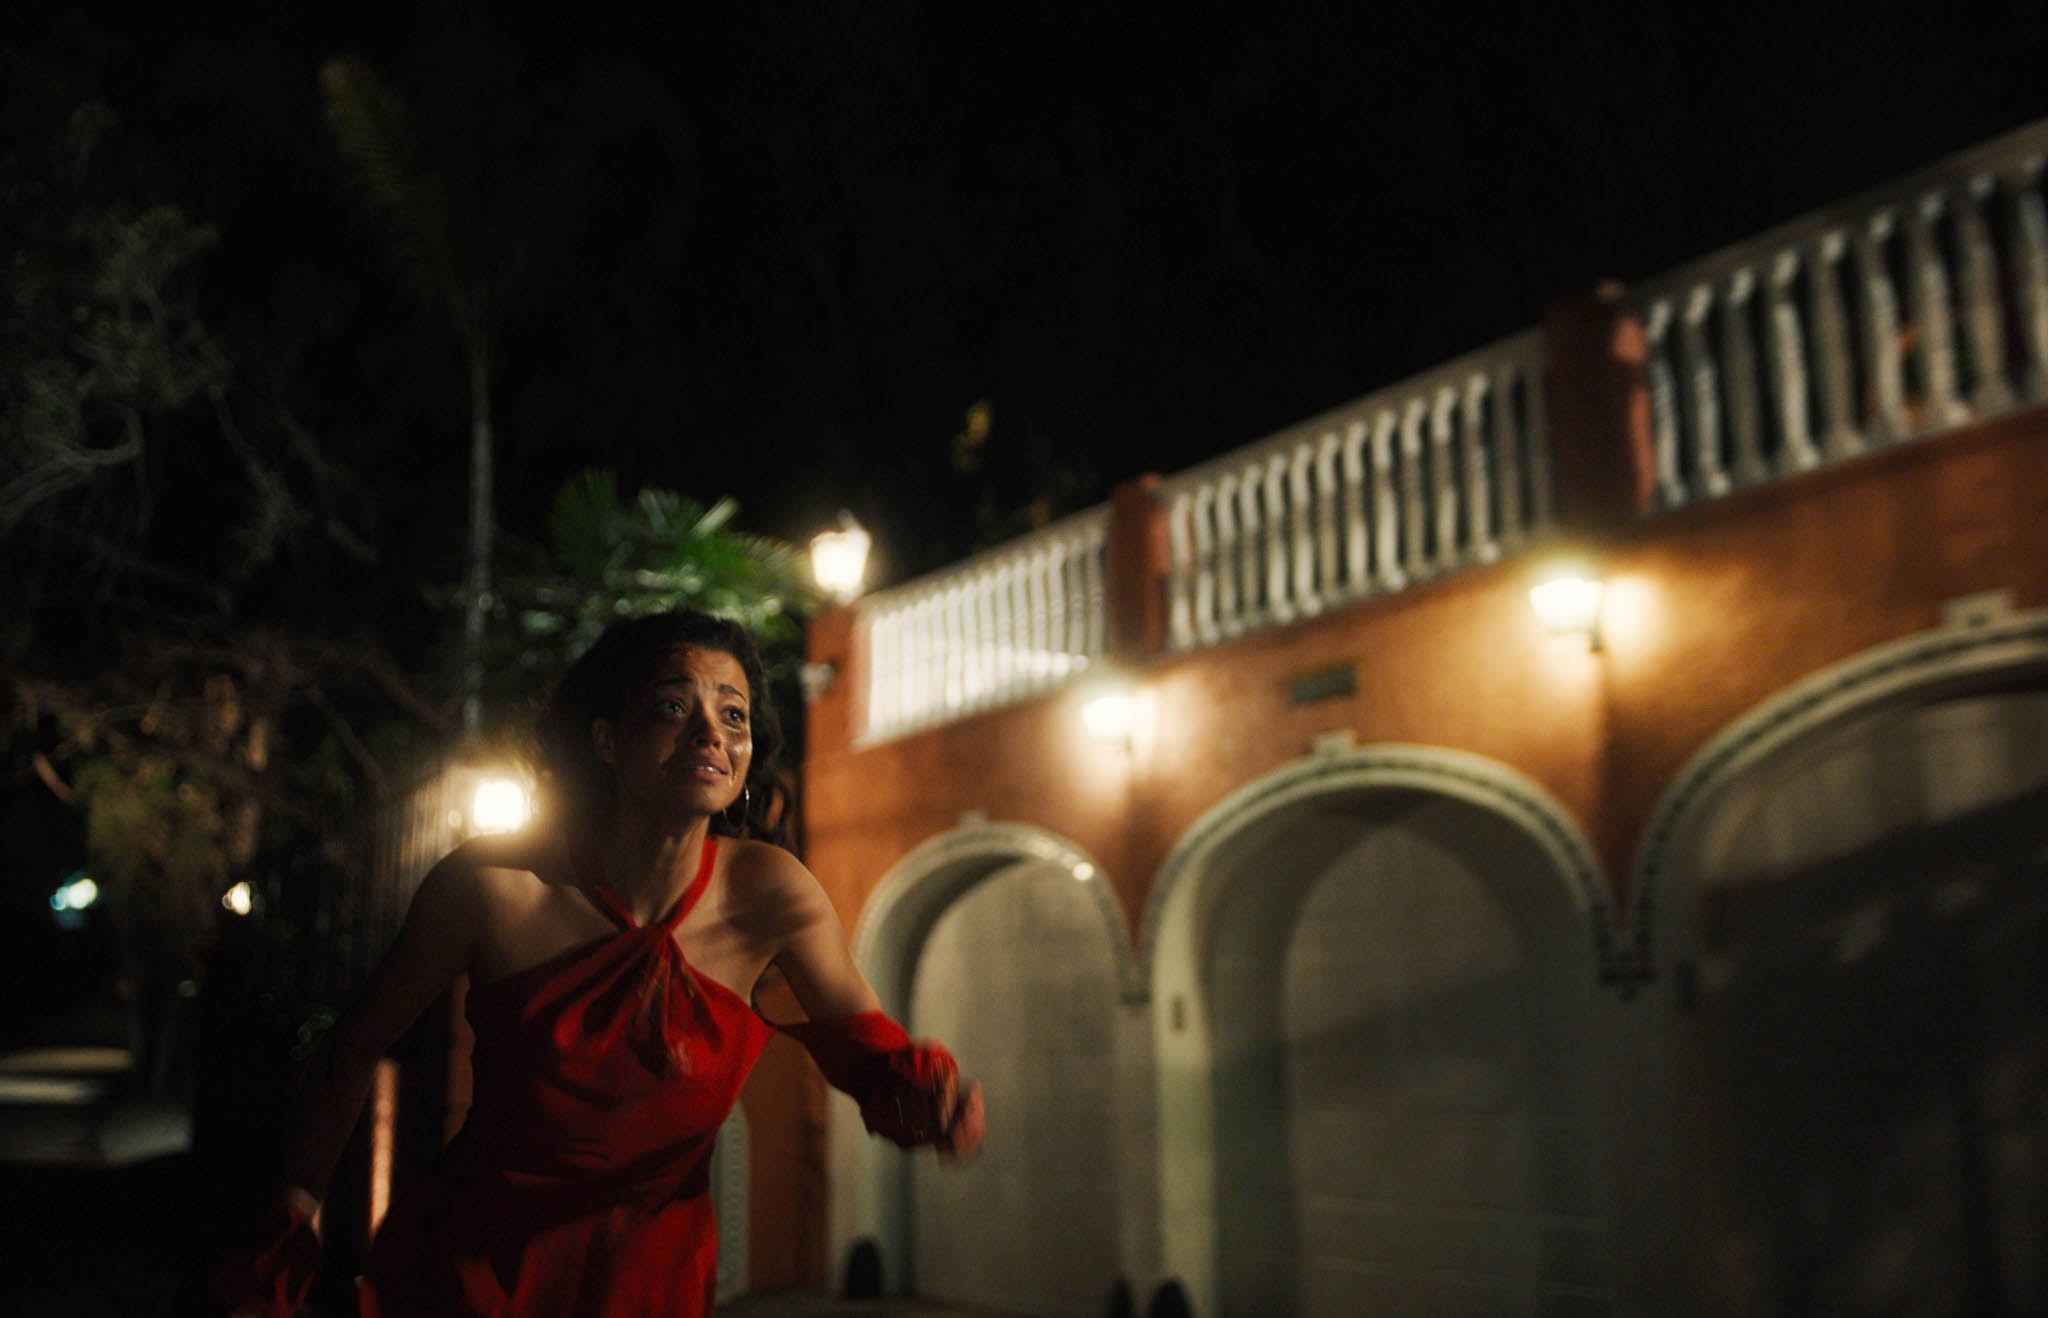 Tense New Photo from Sundance Horror 'Run Sweetheart Run' - Bloody Disgusting